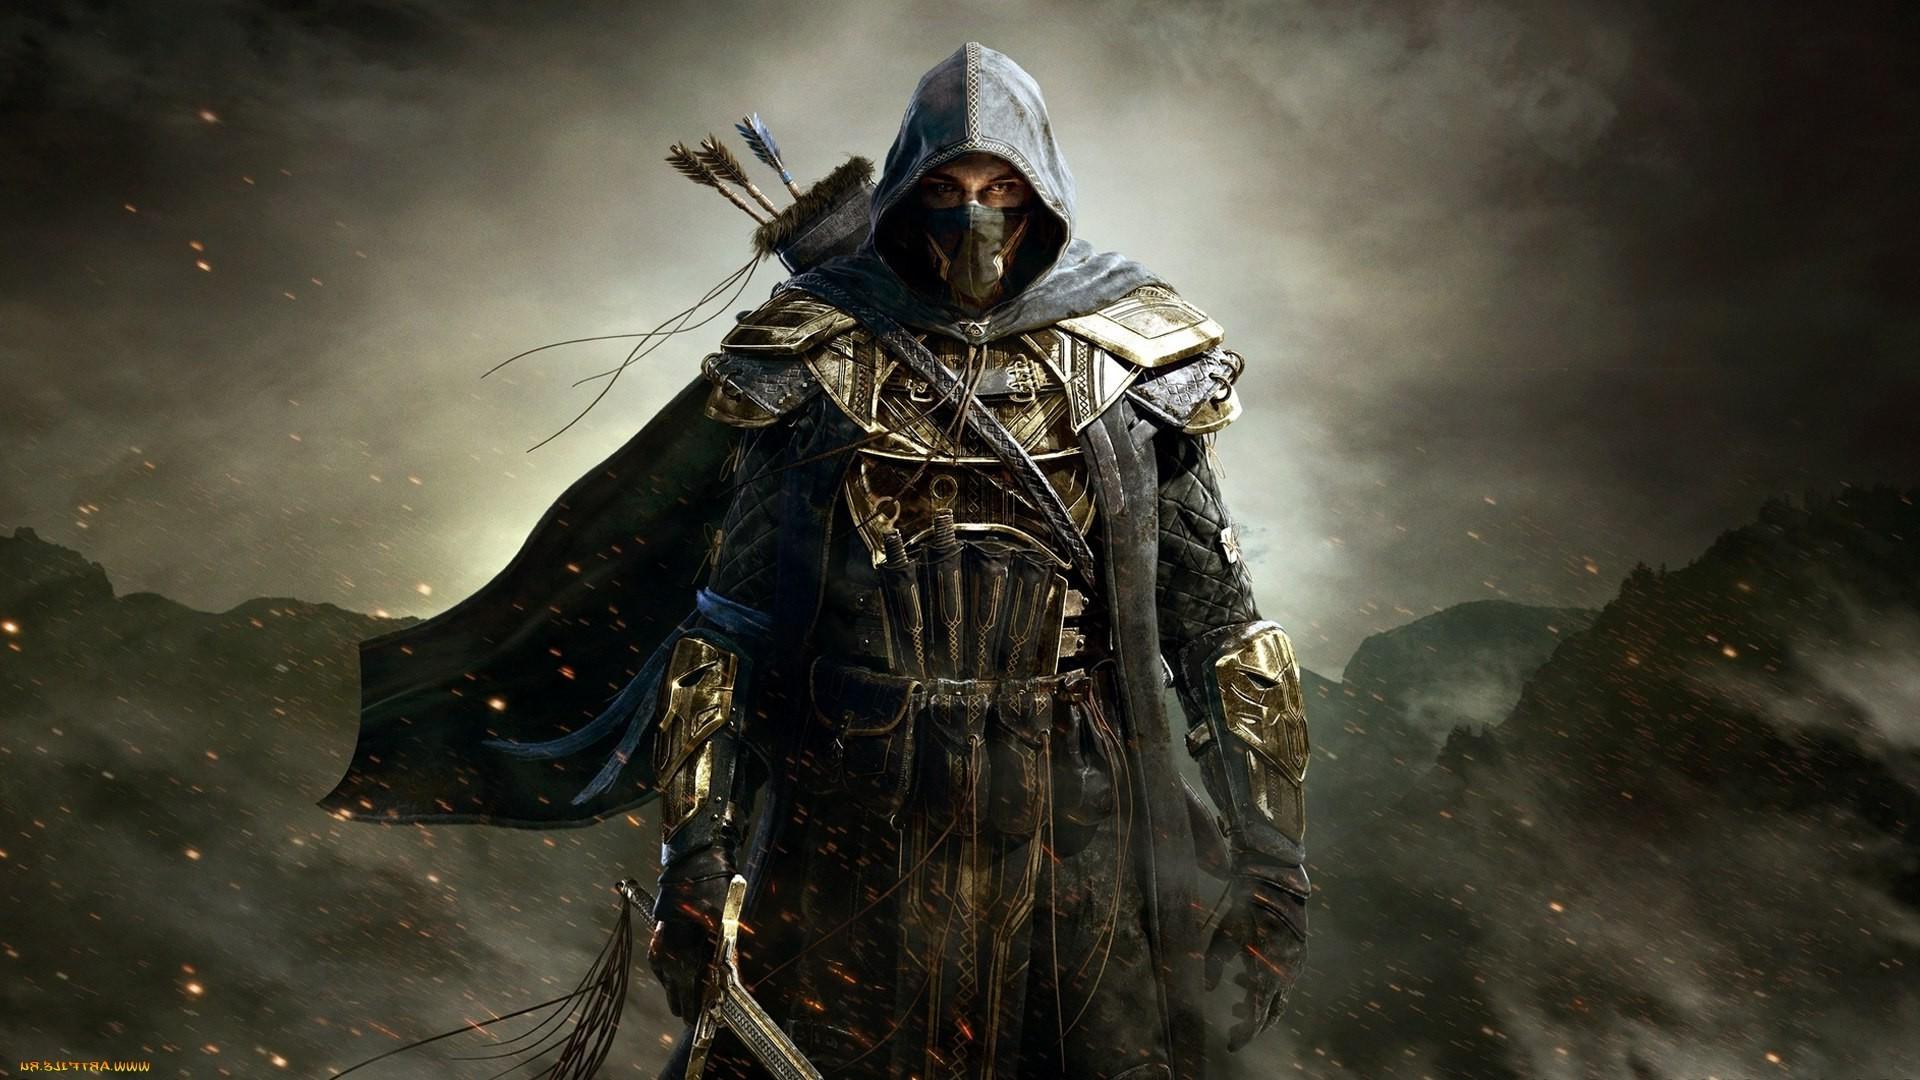 Wallpaper Video Games The Elder Scrolls Online Mythology